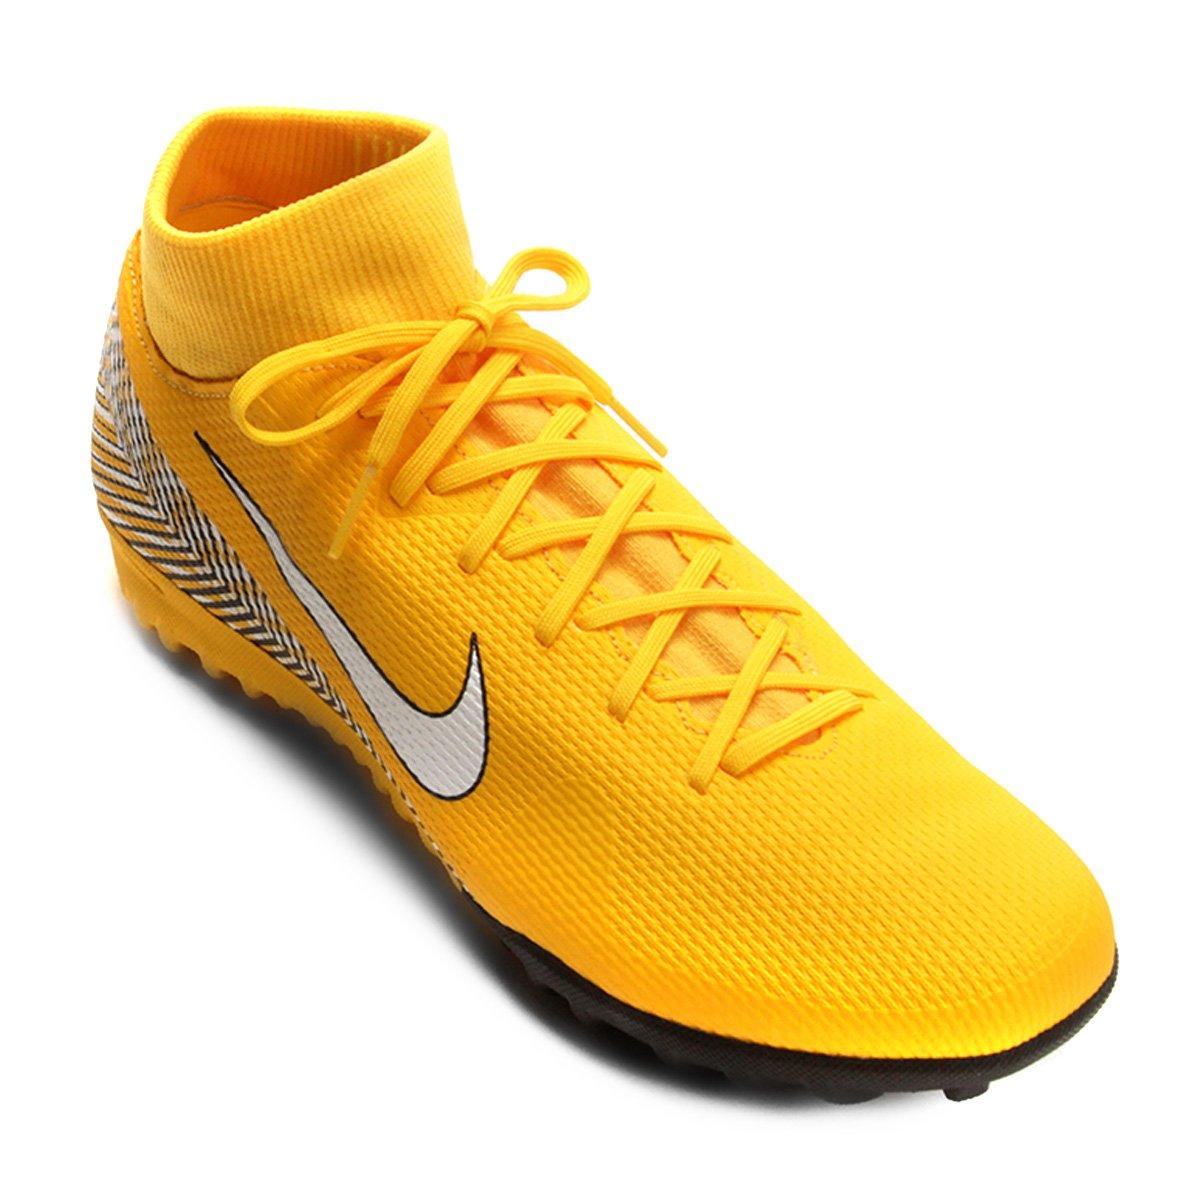 9e1d8ac312 Chuteira Society Nike Mercurial Superfly 6 Academy Neymar TF - Compre Agora